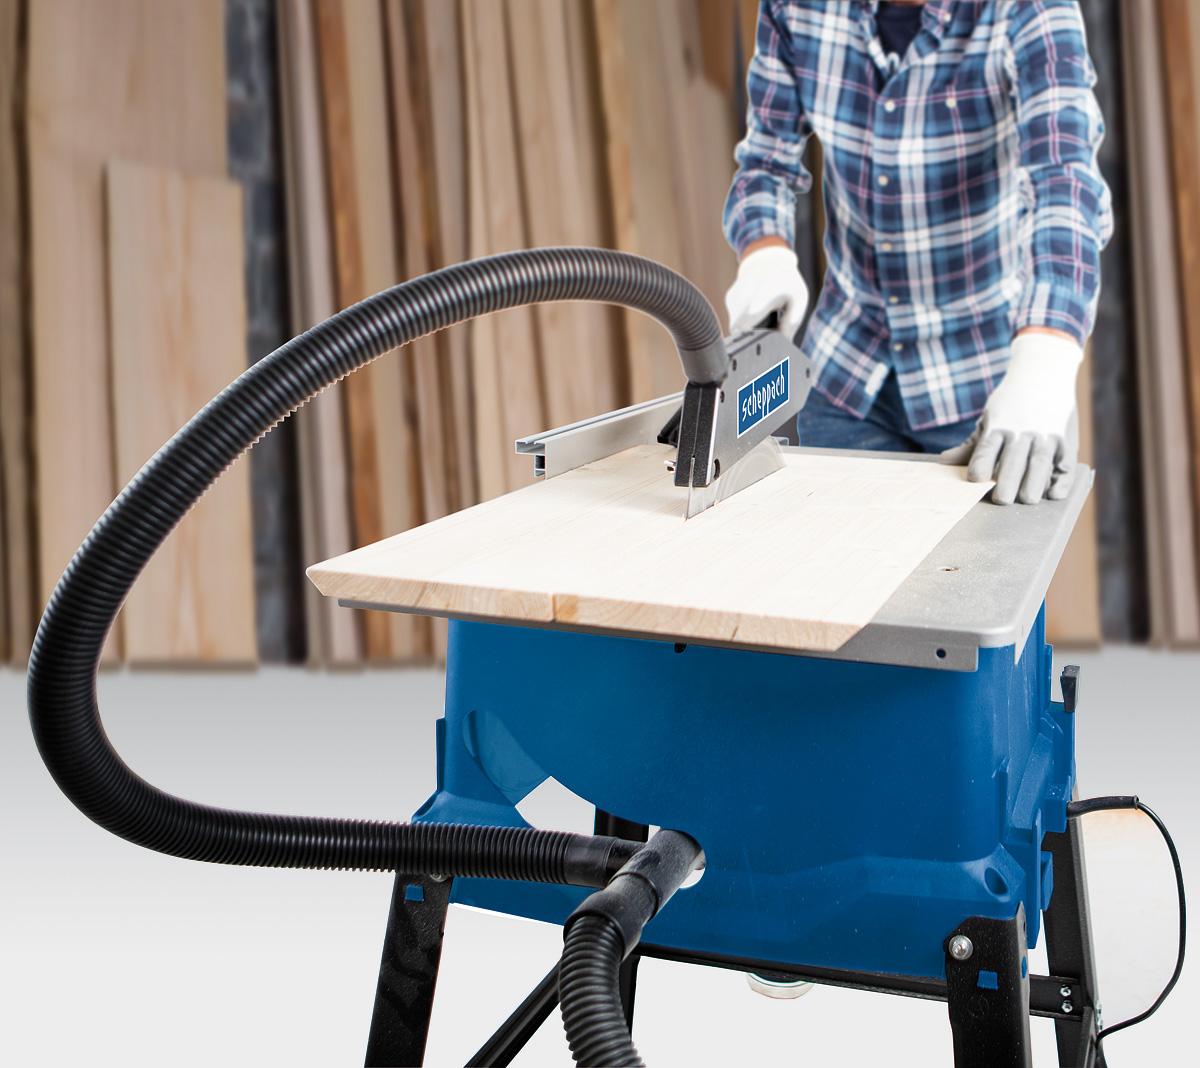 scheppach stolov pila hs 100 s z ruka 4 roky bez omezen servis extra esk. Black Bedroom Furniture Sets. Home Design Ideas